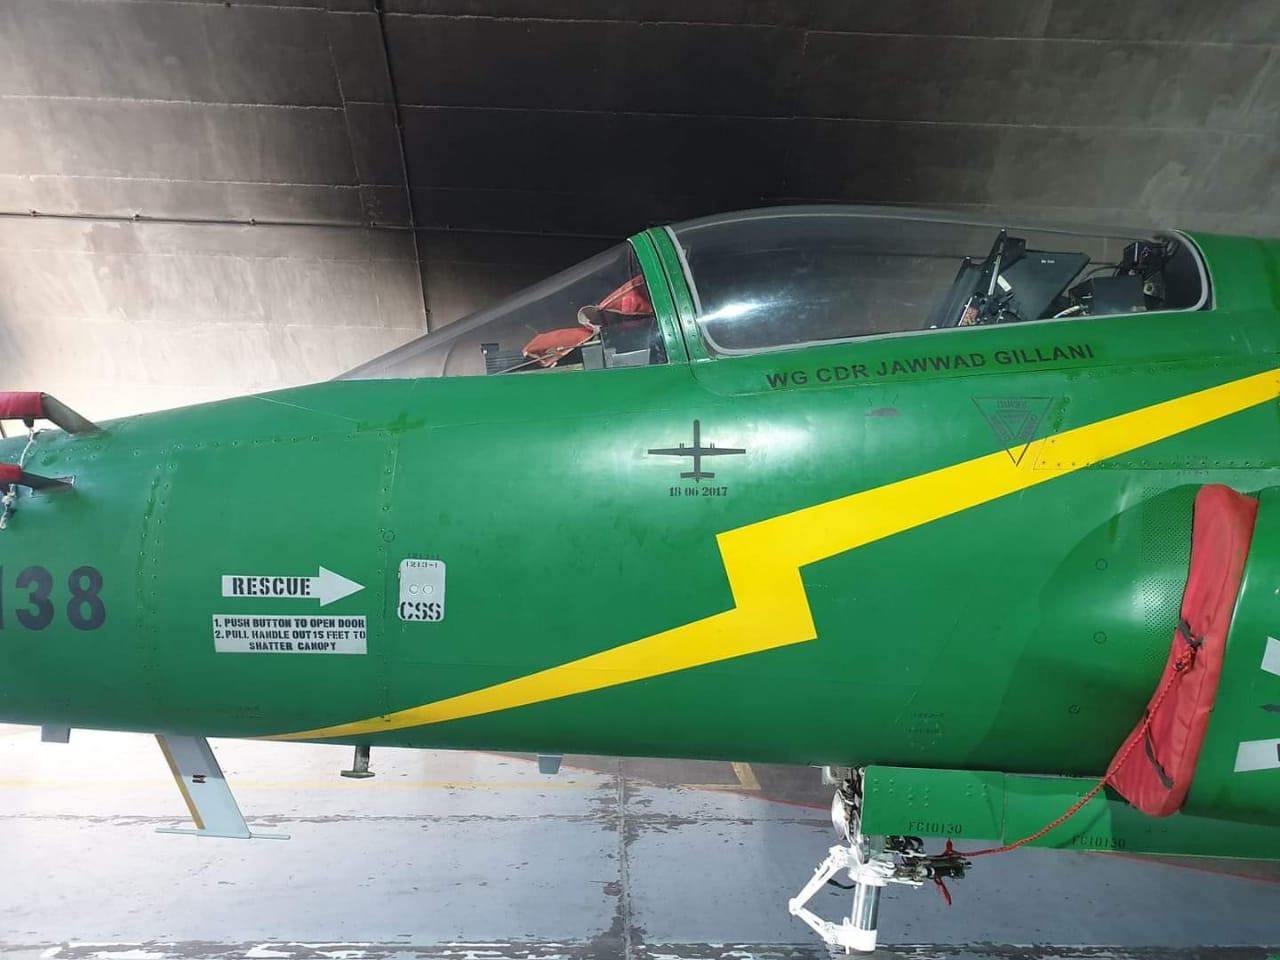 IRGC Shahed 129 UCAV Kill Mark Spotted On PAF JF-17 Thunder